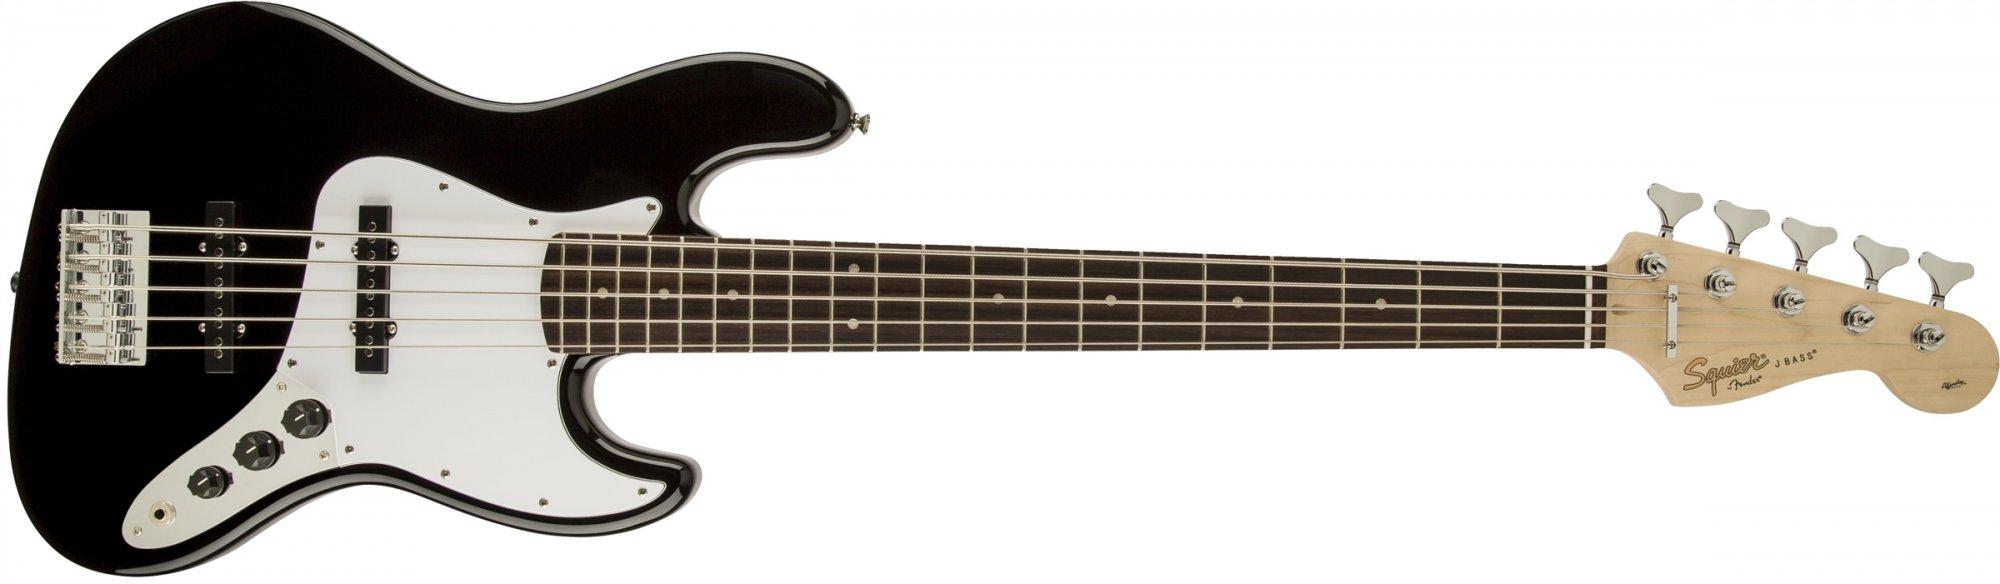 Affinity J Bass V Black